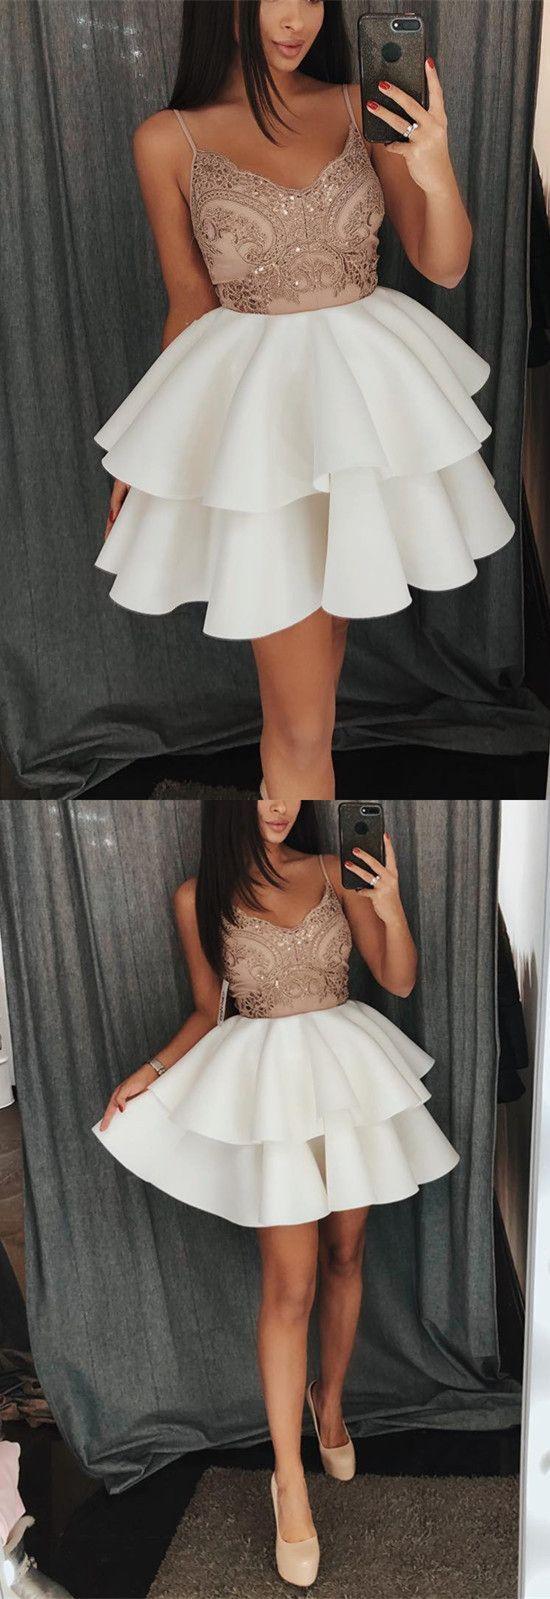 Short White Ruffles Prom Dresses Lace Appliques Evening Dress for Cocktail – Kleider